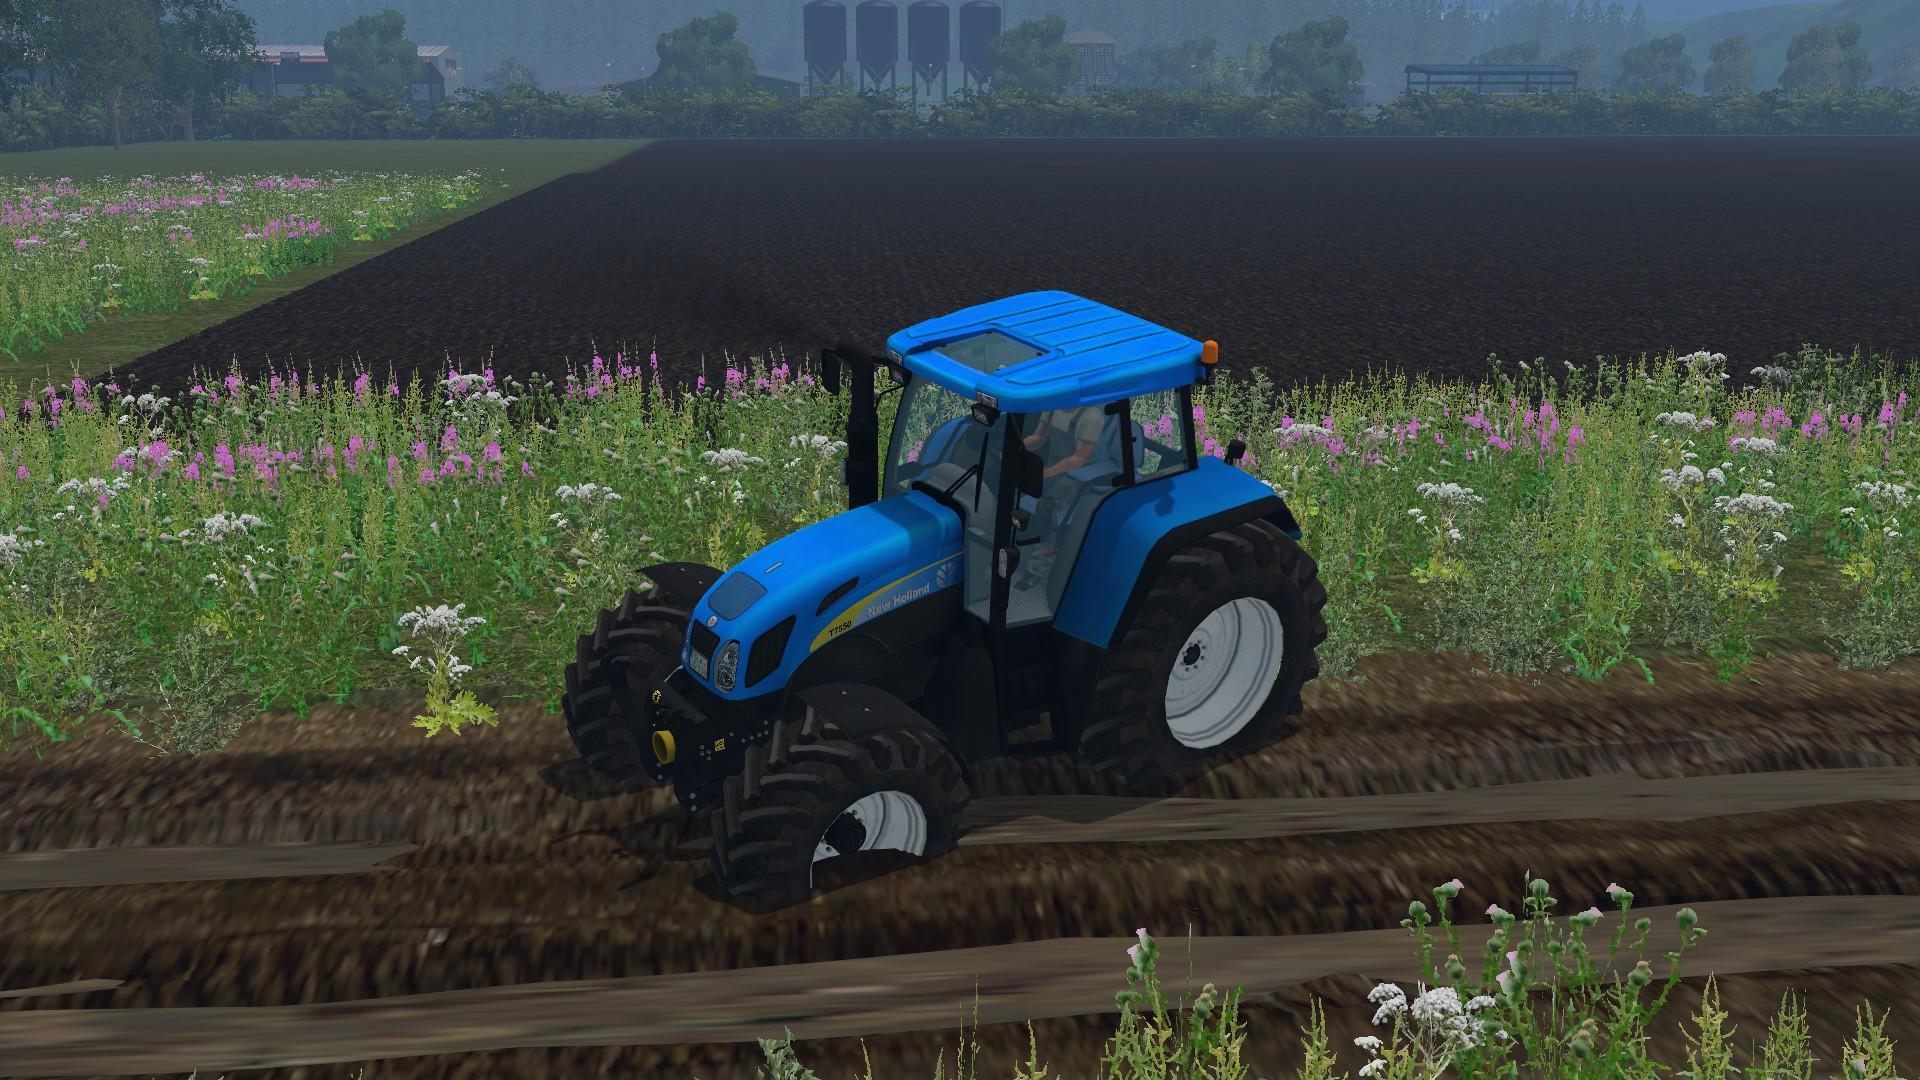 NEW HOLLAND T7550 Tractor V3 0 - Farming simulator 2019 / 2017